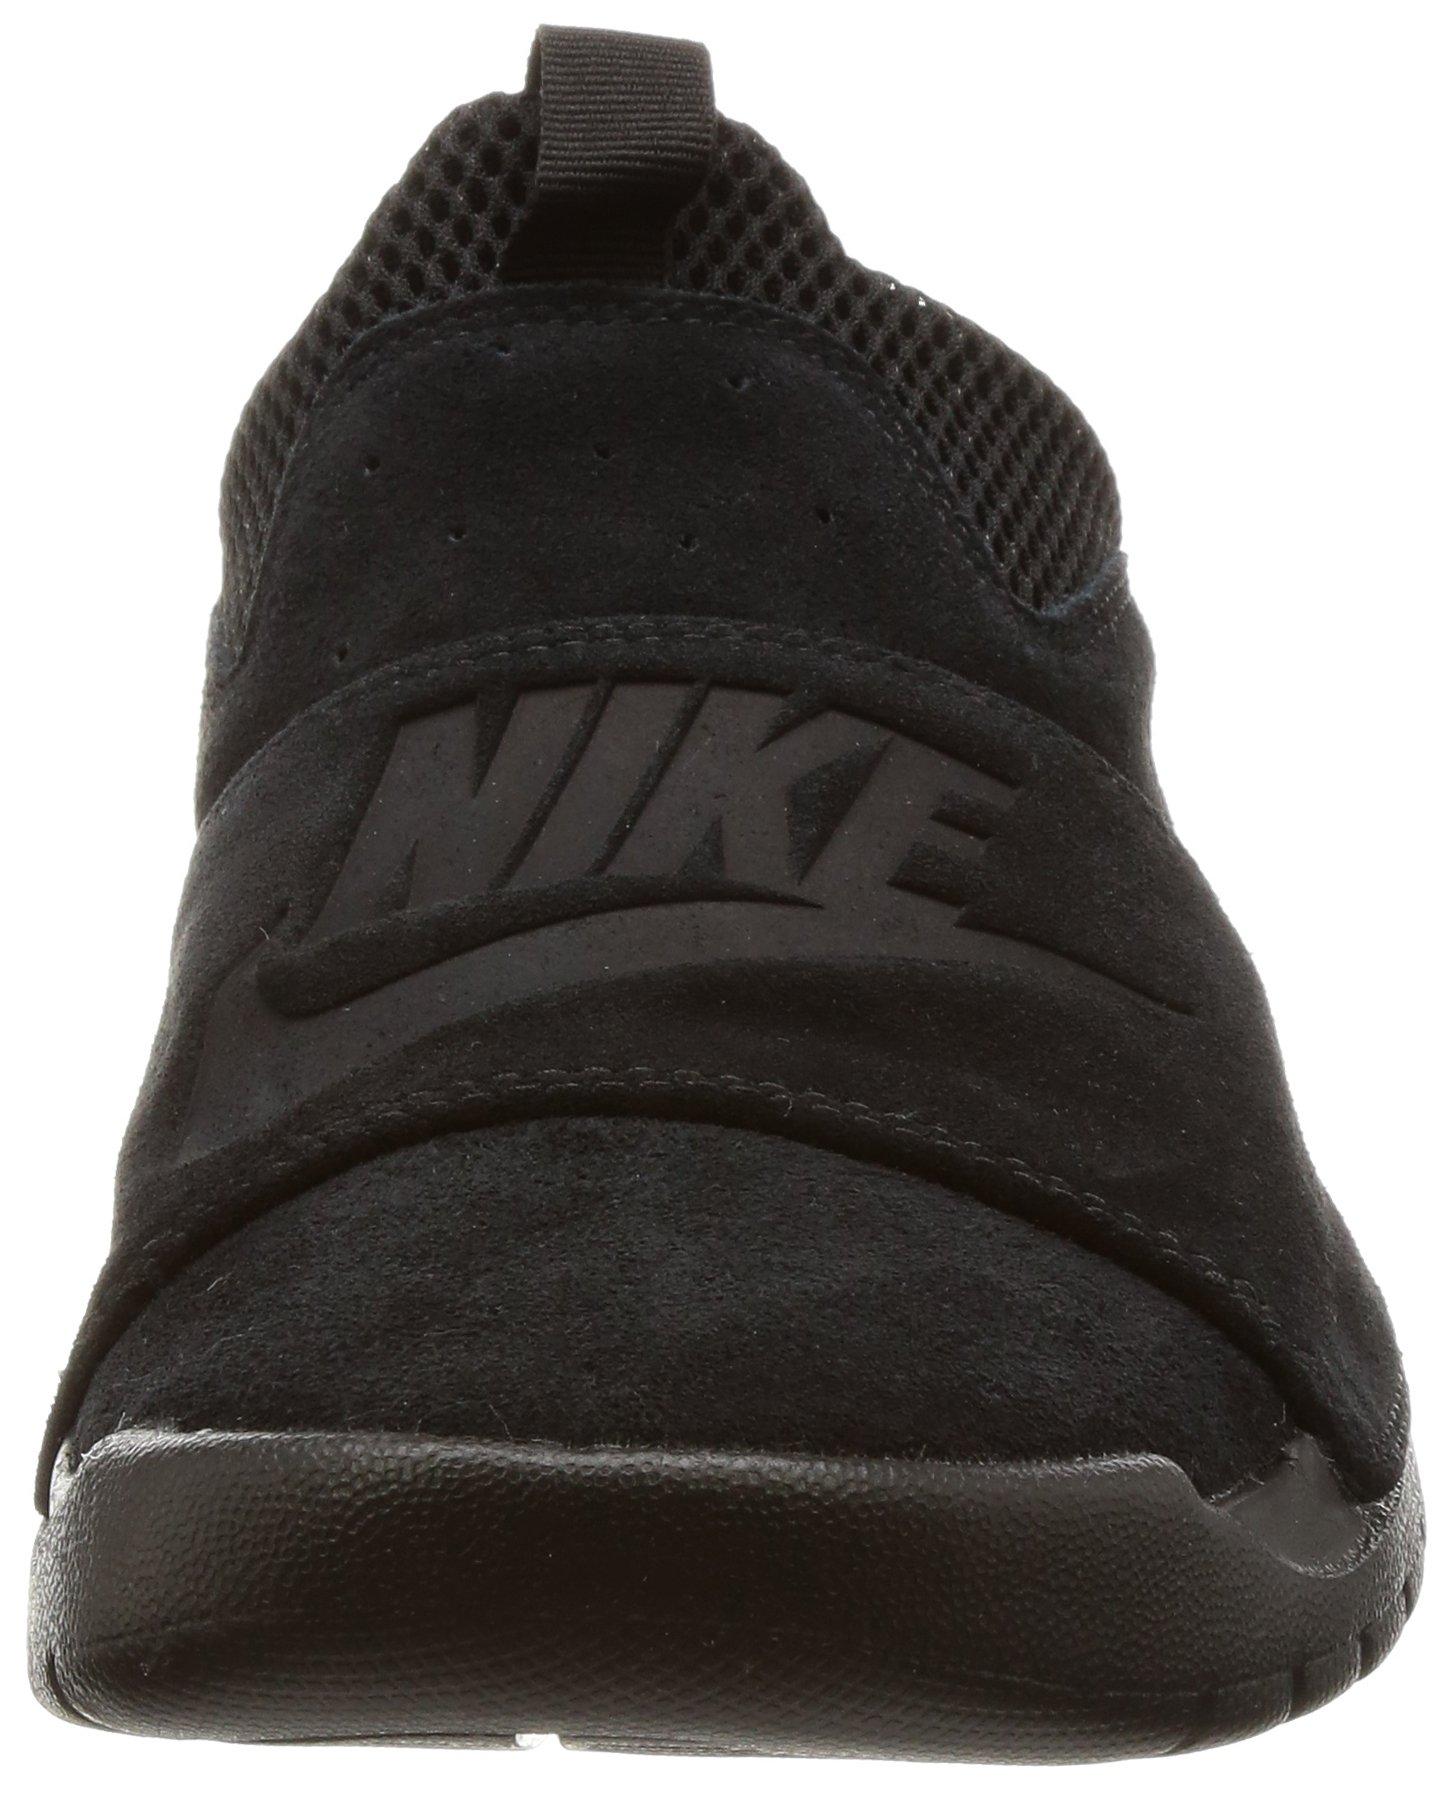 Nike BENASSI SLP Mens fashion-sneakers 882410-003_9.5 - BLACK/BLACK-BLACK by NIKE (Image #4)